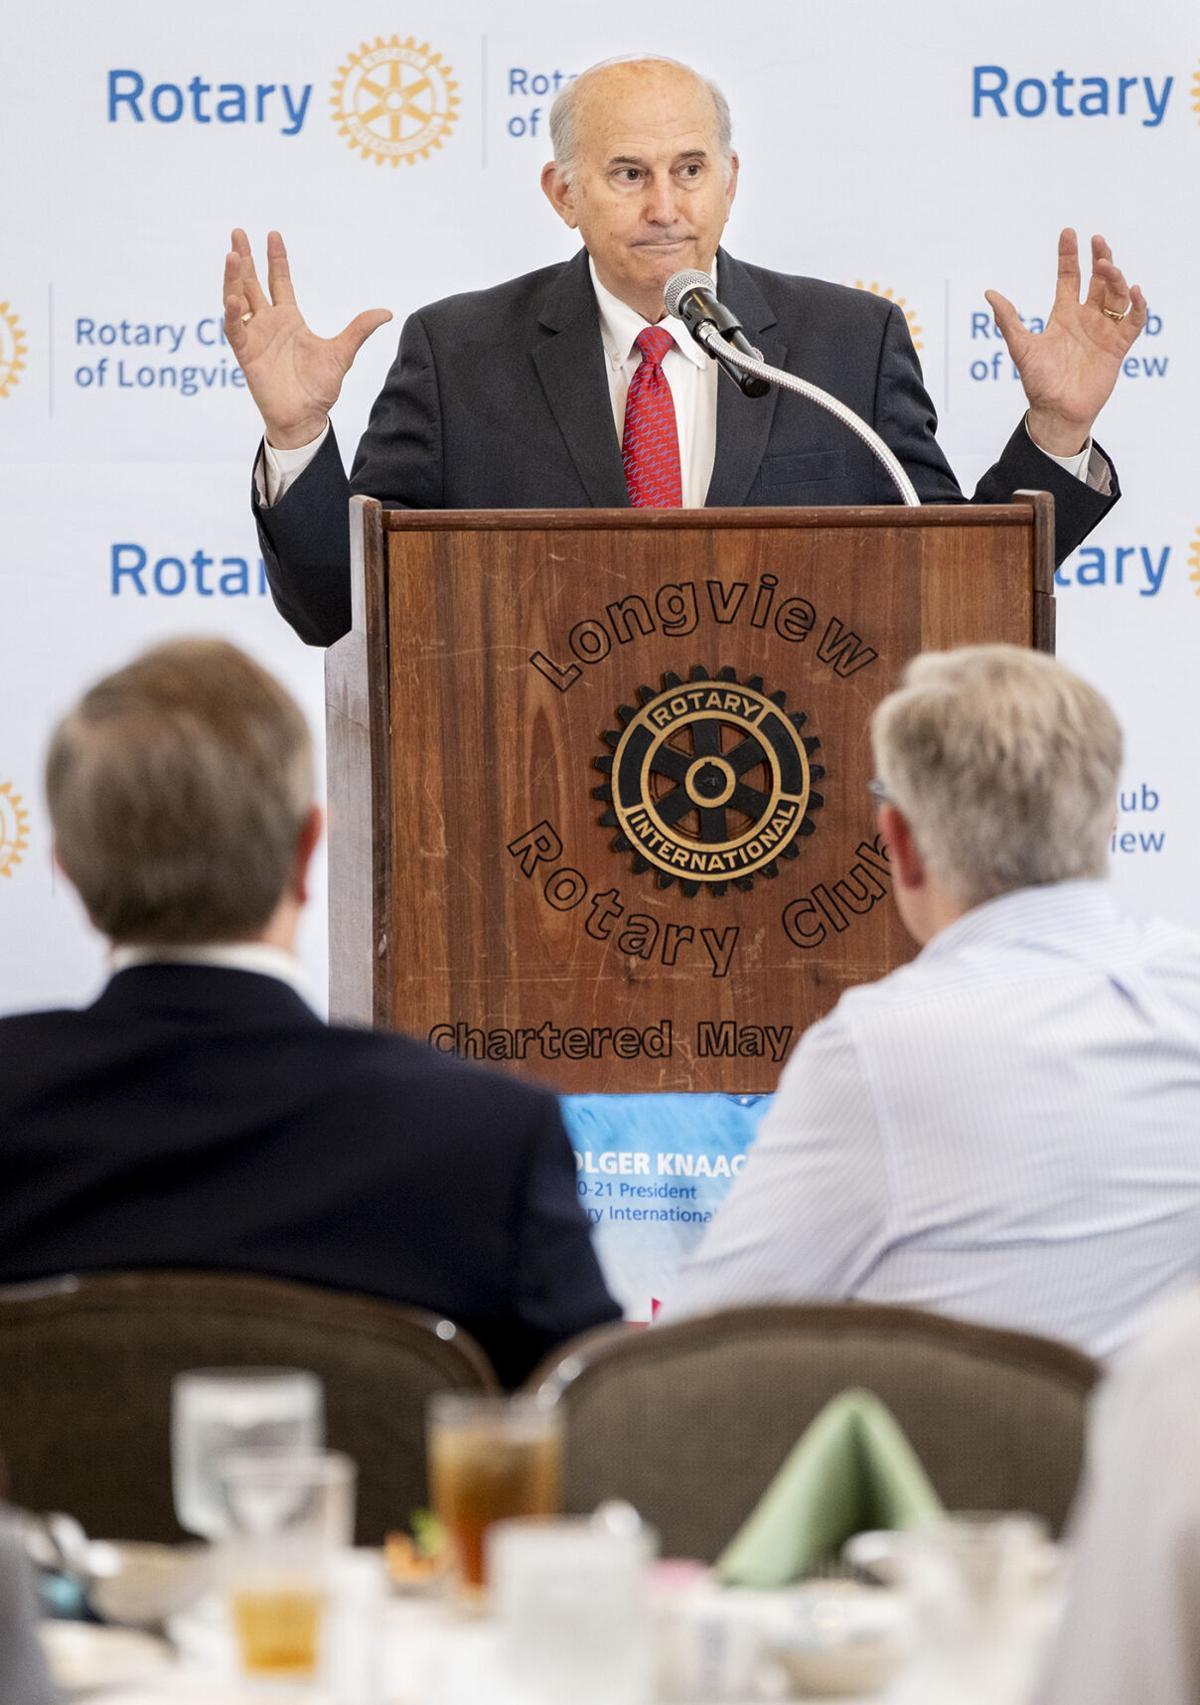 Rotary Club of Longview